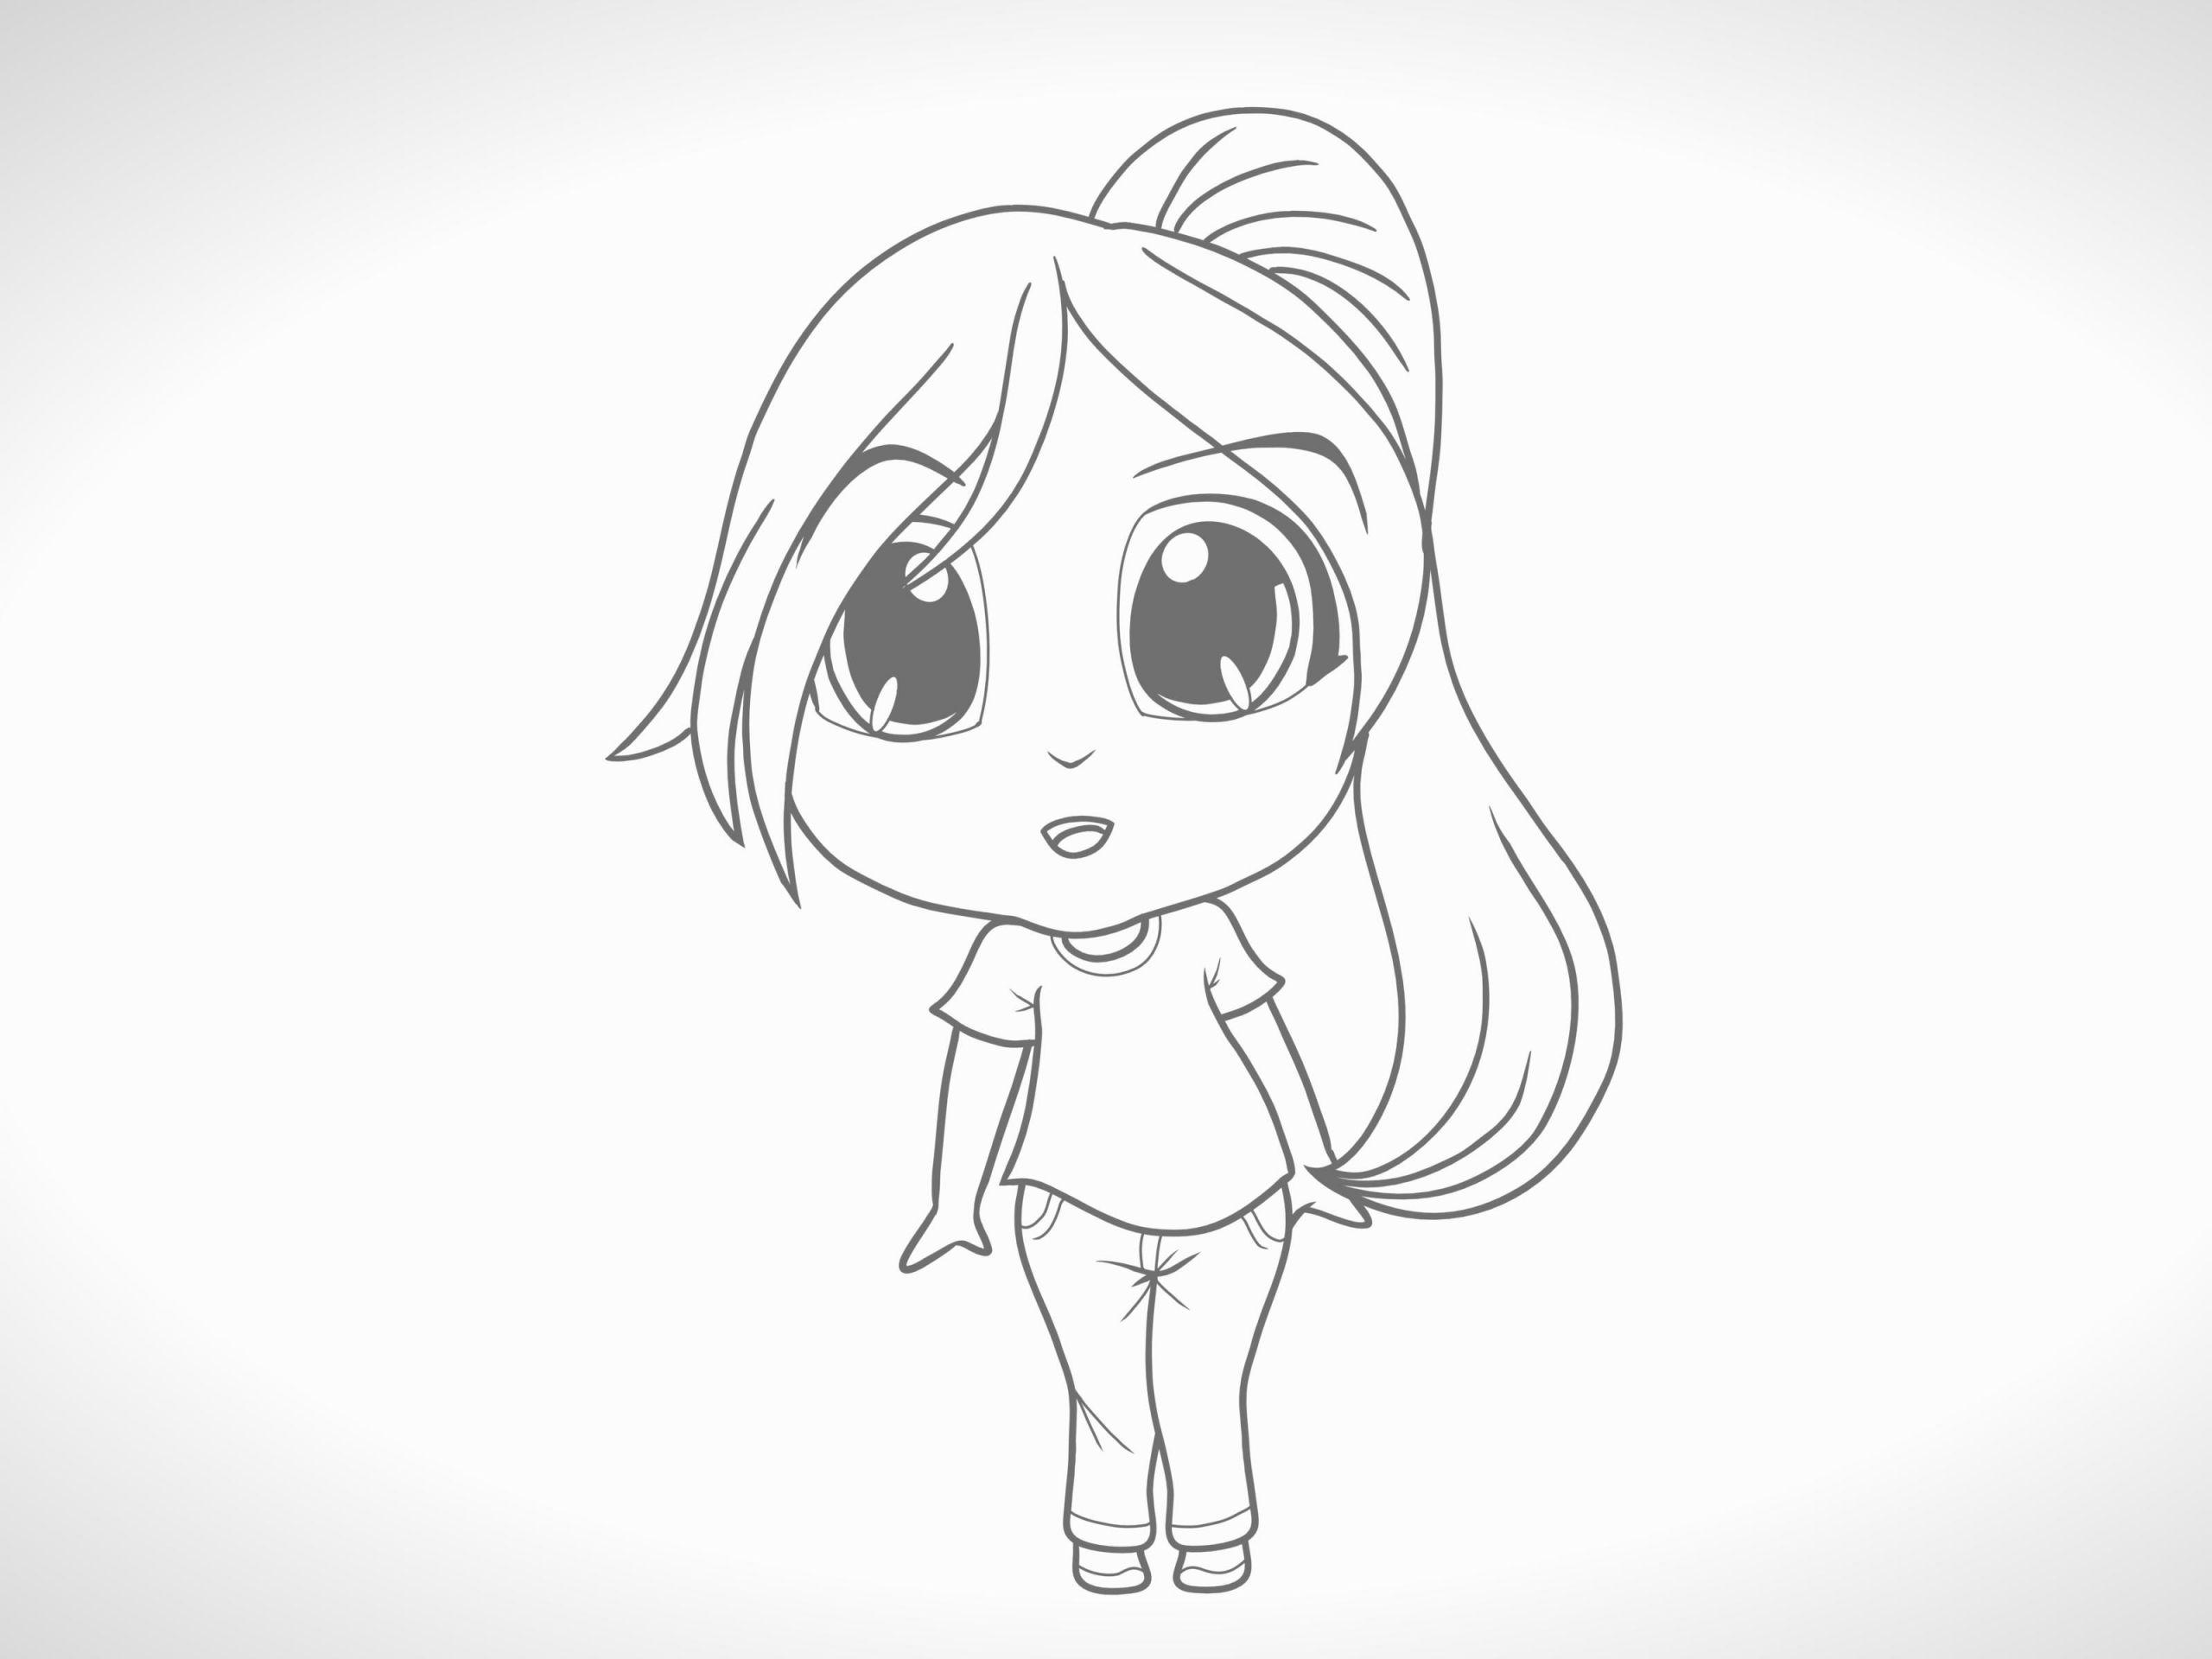 draw a chibi character step 12 version 3 jpg